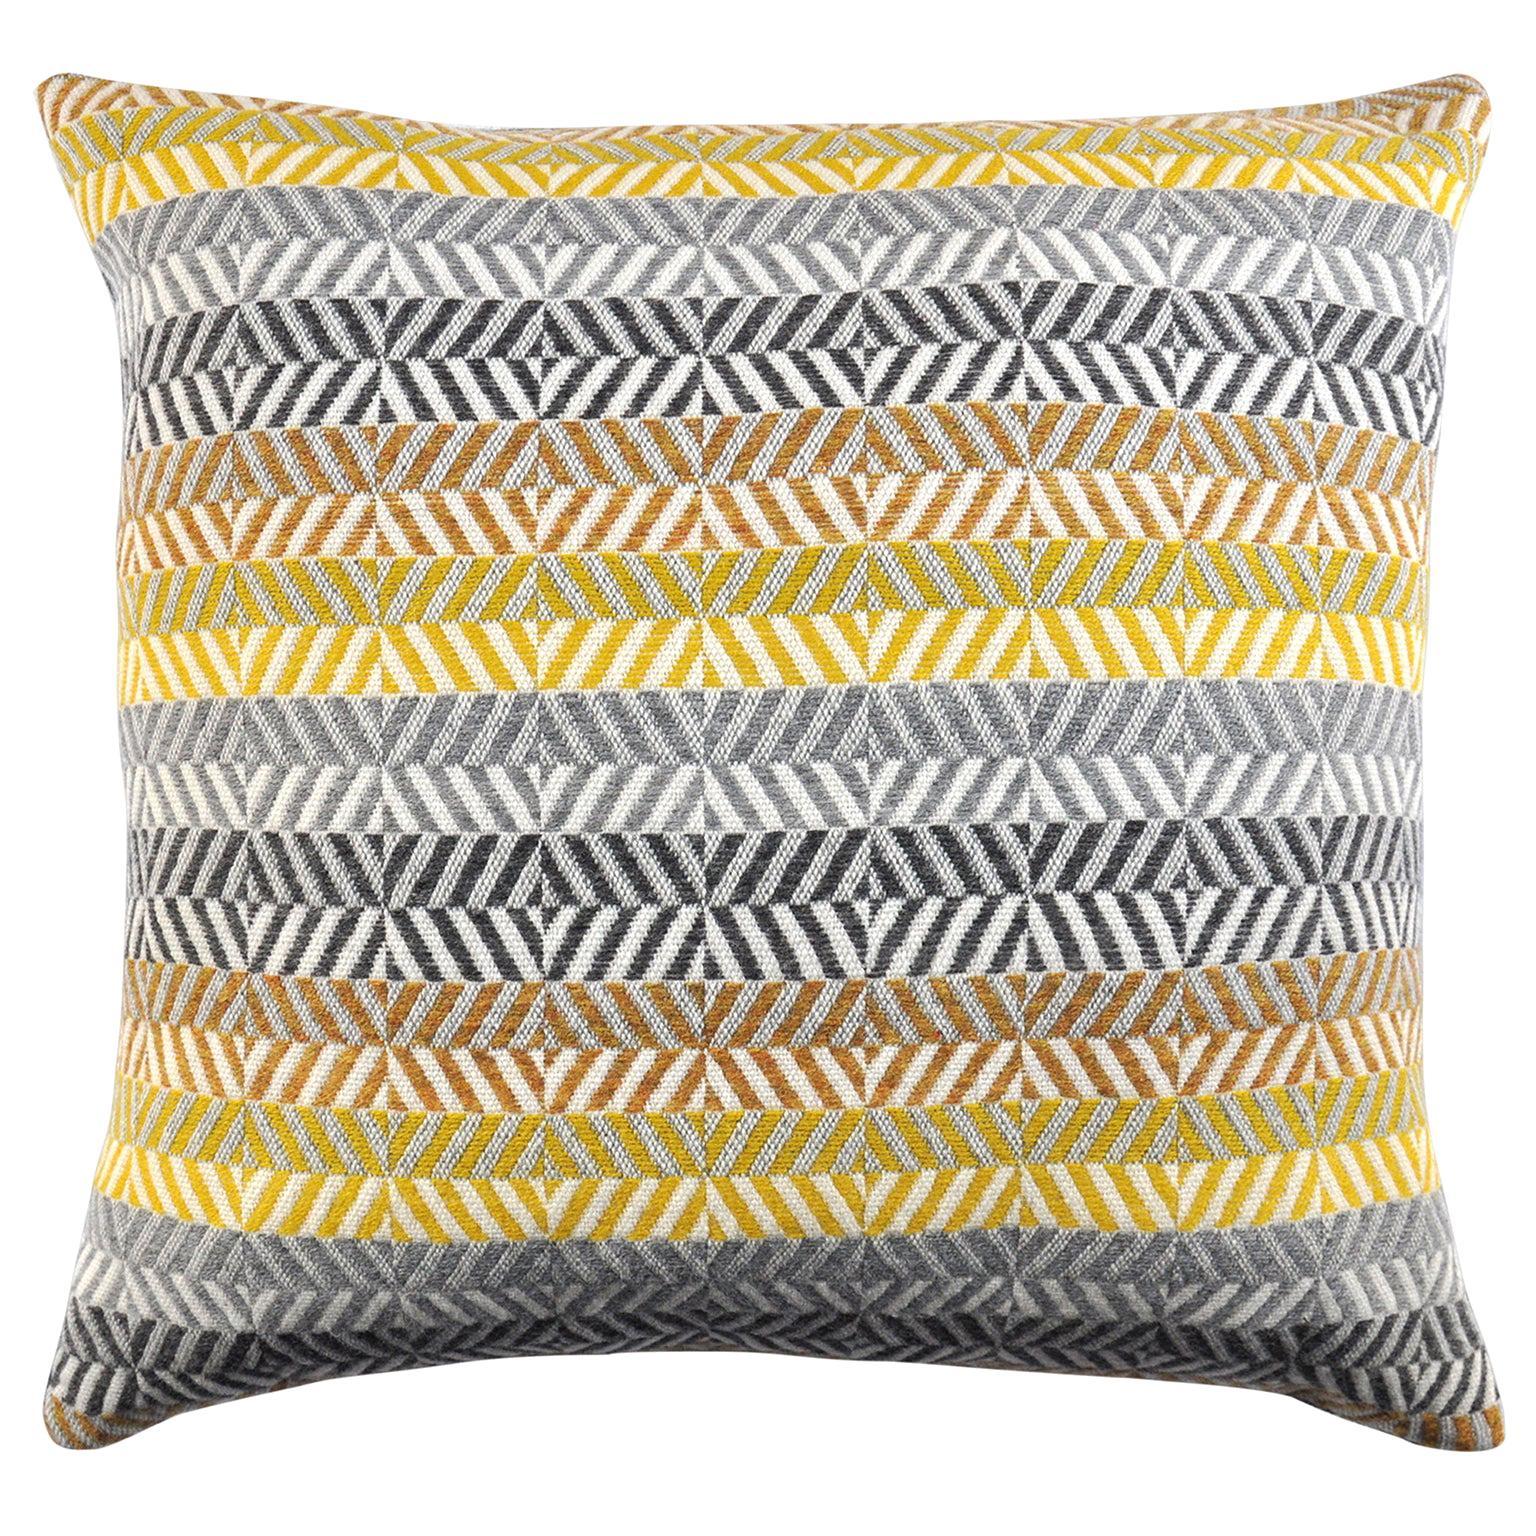 Handwoven 'Saint Gilles' Merino Wool Cushion Pillow, Piccalilli Yellow/Greys